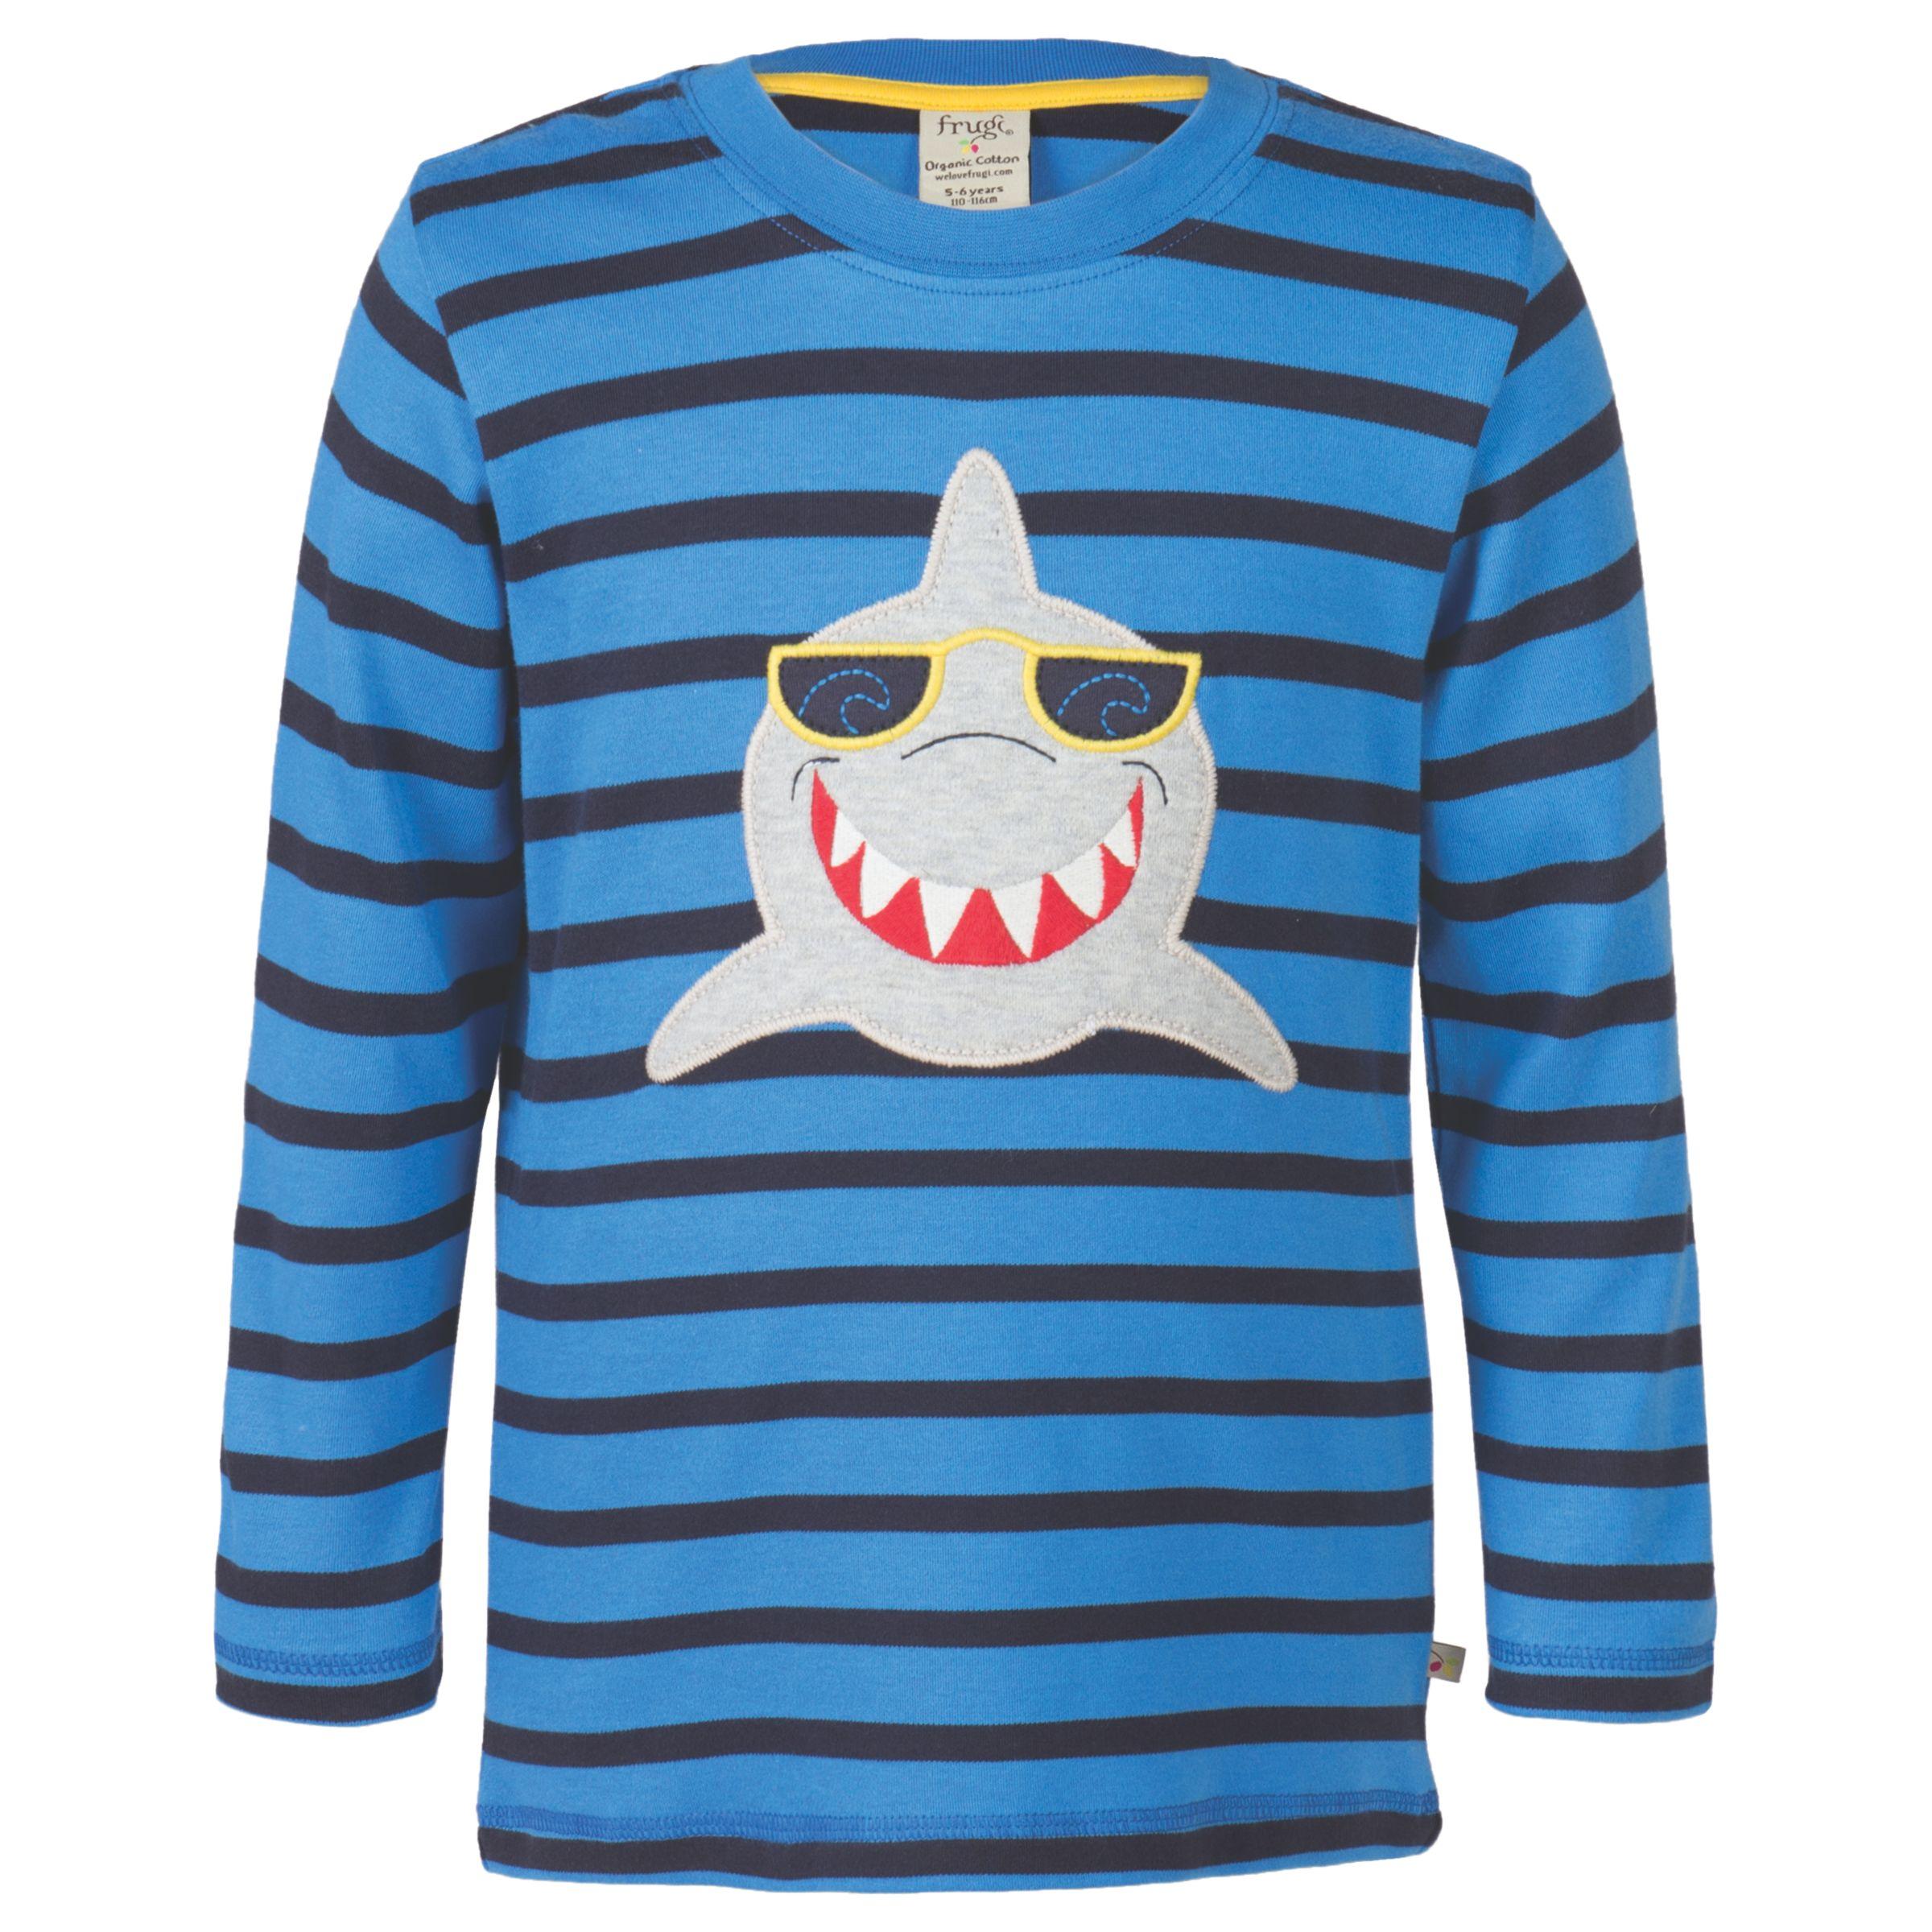 Frugi Organic Frugi Organic Boys' Discovery Shark Top, Blue